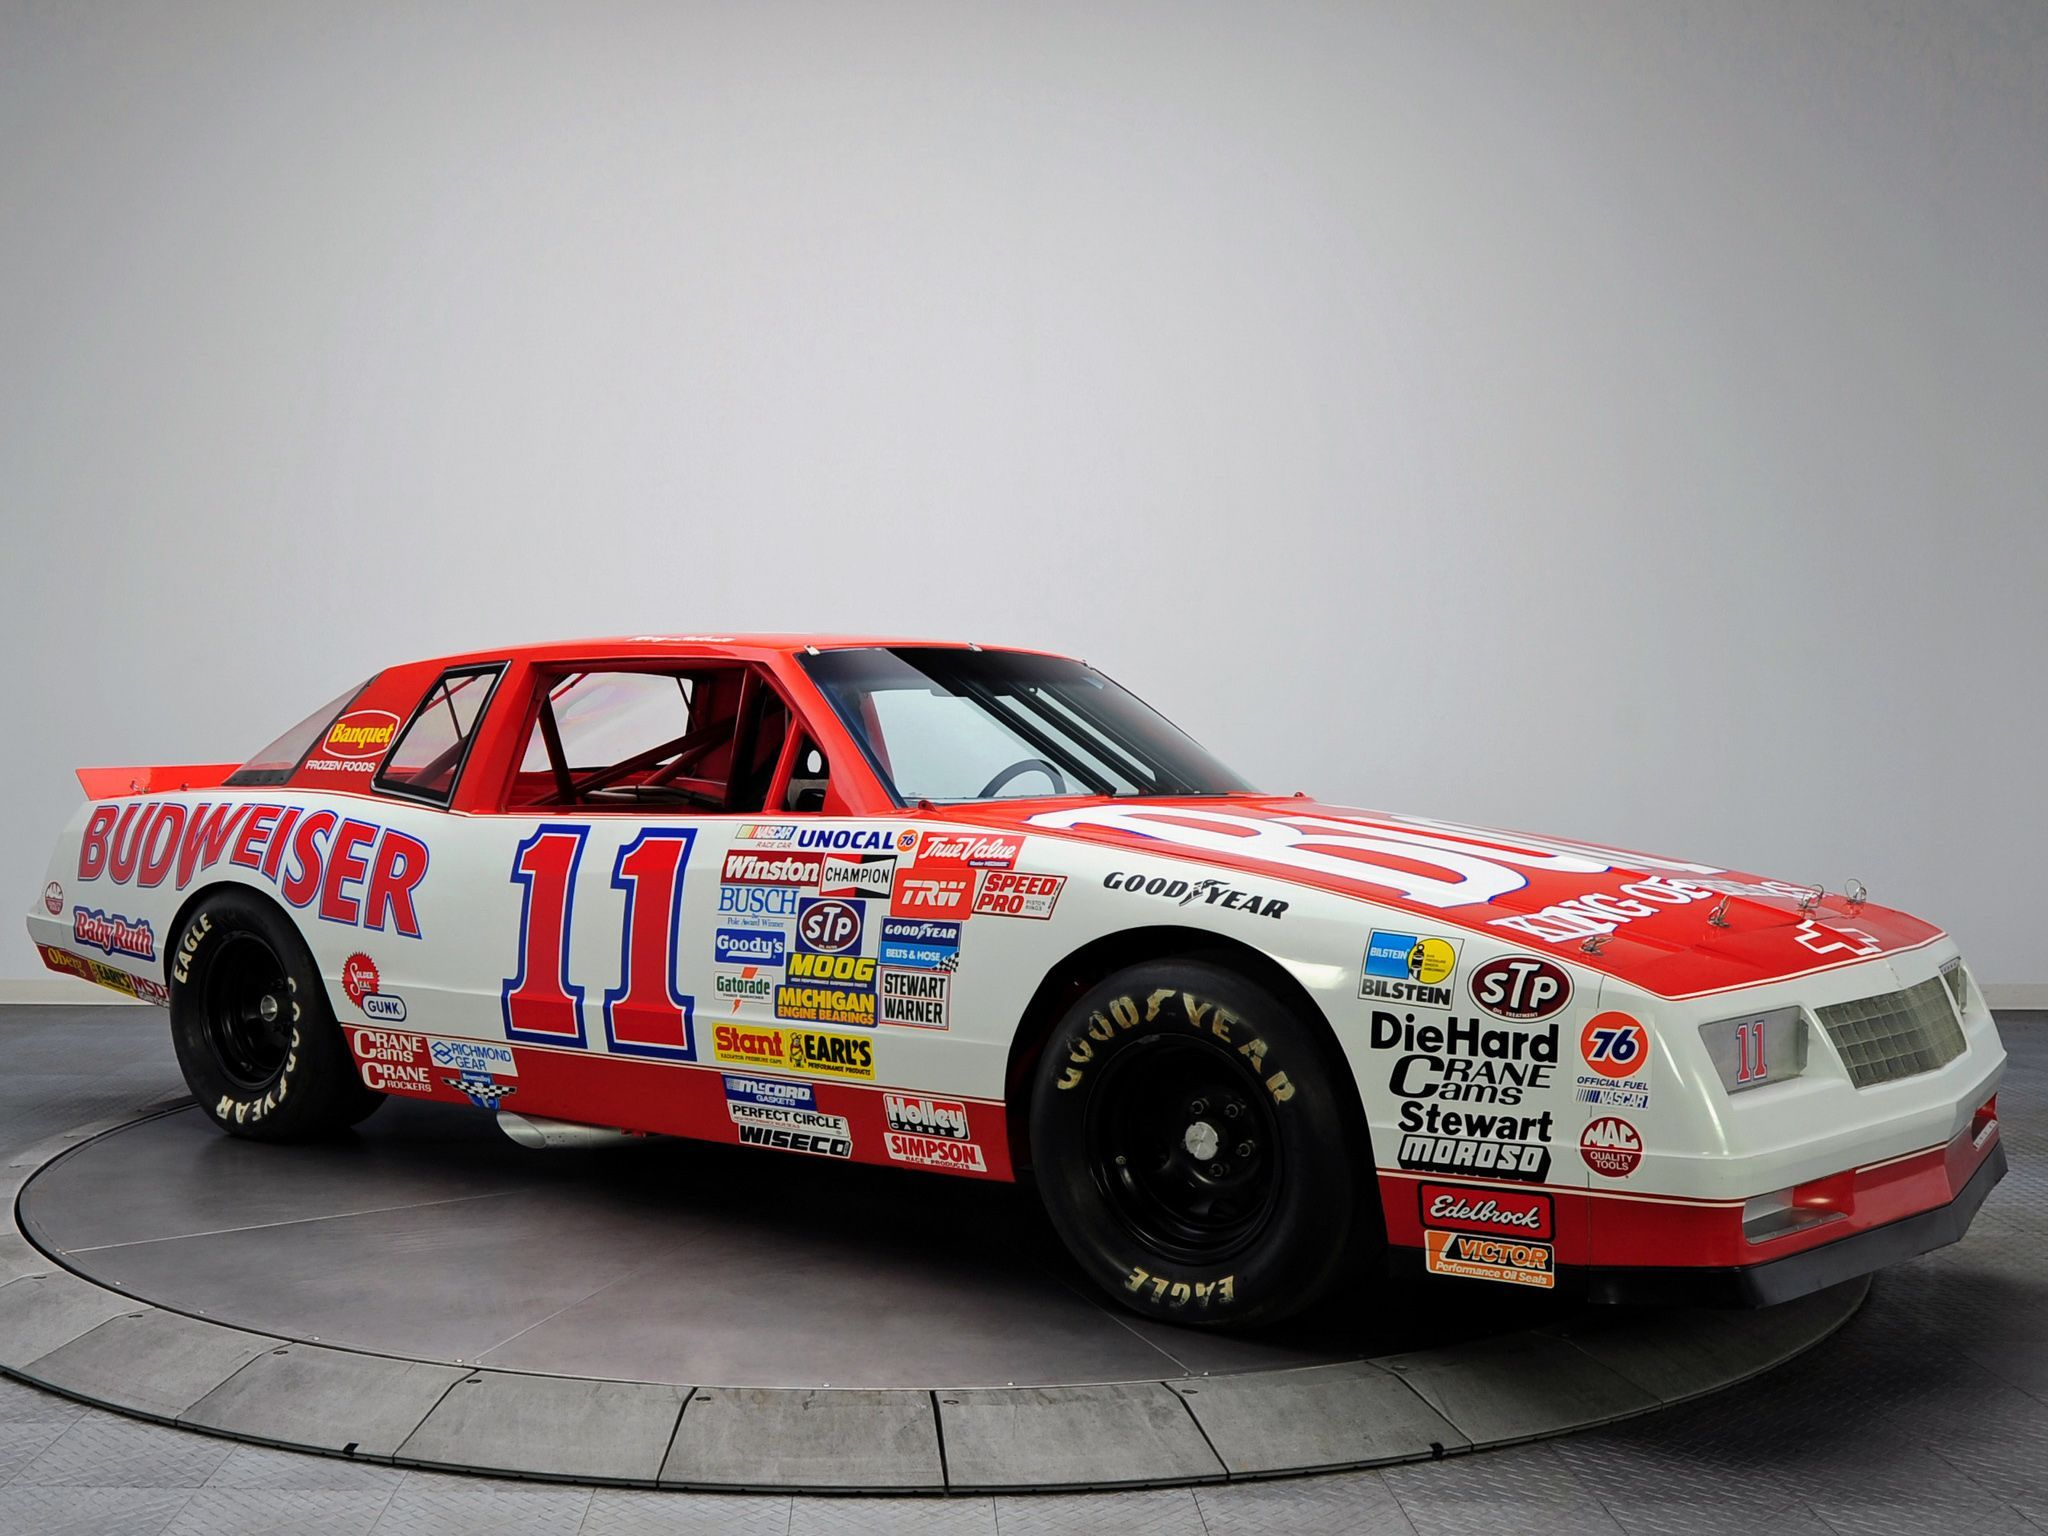 1988 Chevrolet Monte Carlo SS NASCAR Race Car | Autosport ...